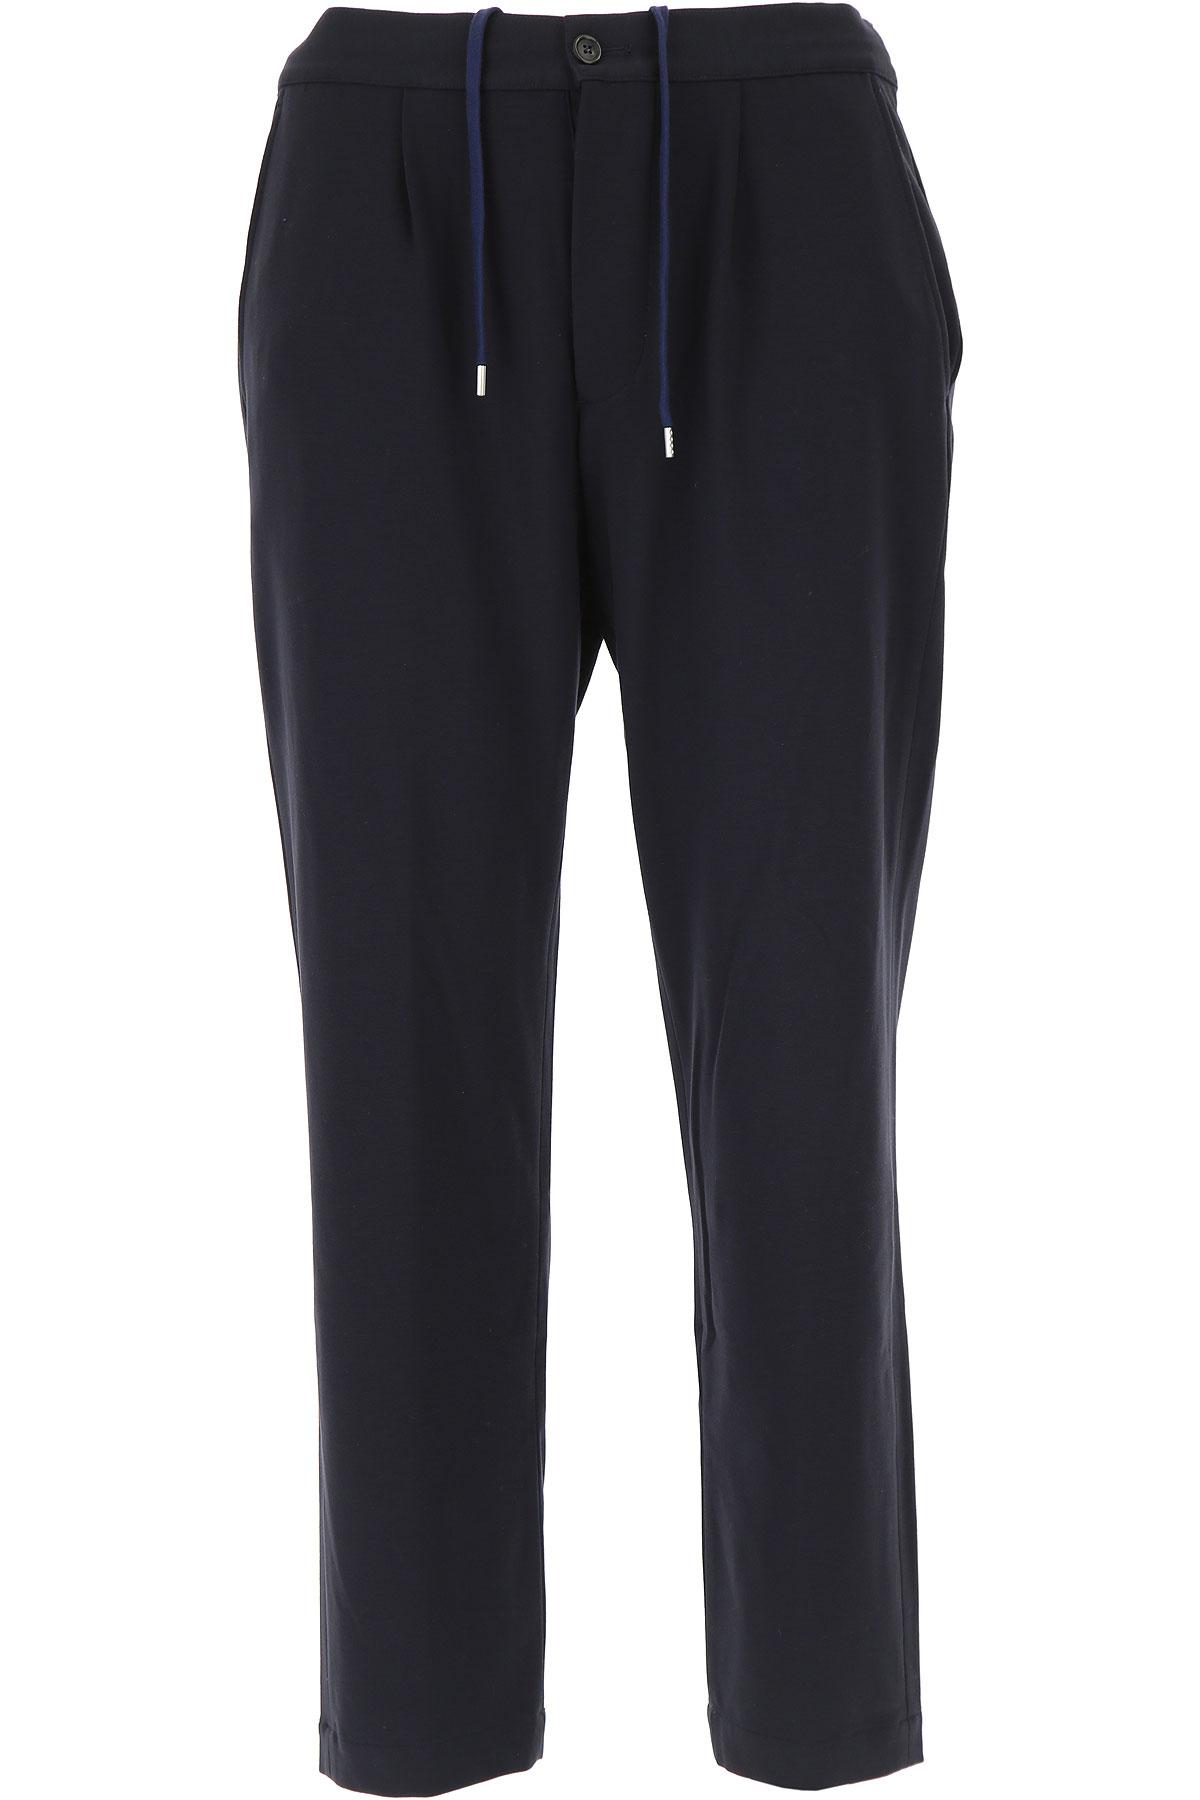 Image of Mauro Grifoni Pants for Men, Blue Navy, Viscose, 2017, 30 32 34